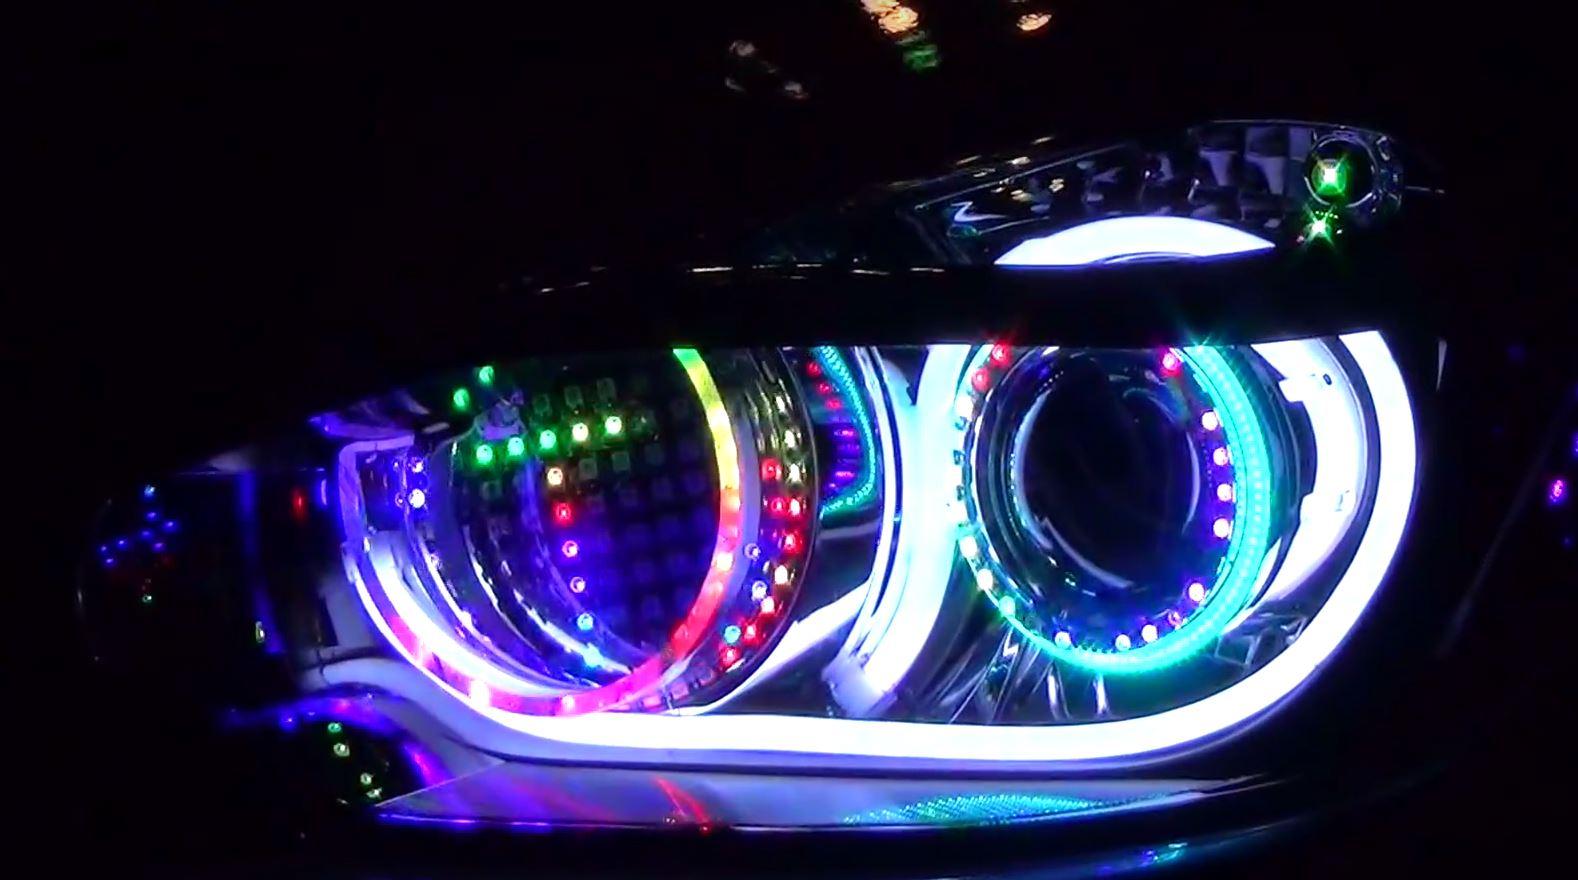 These Japanese Custom LED Headlights Can Spell - autoevolution